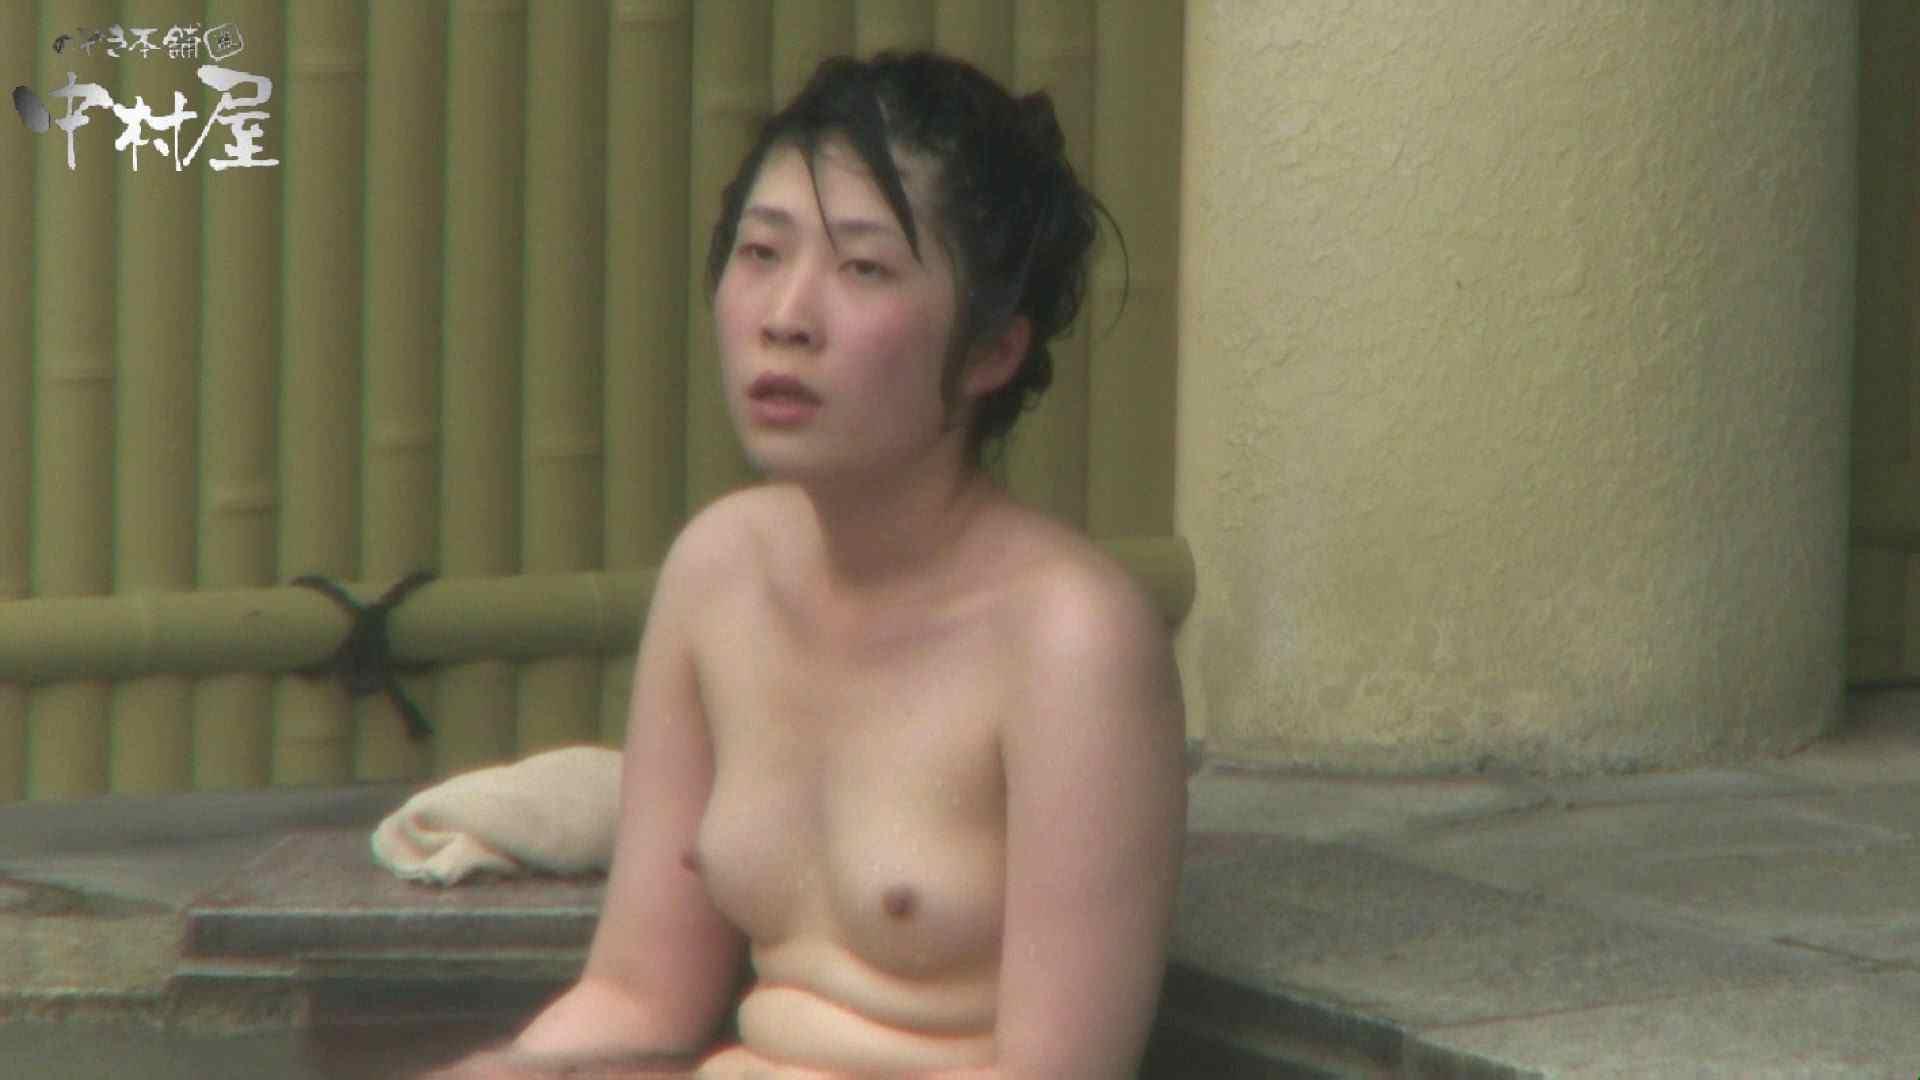 Aquaな露天風呂Vol.955 盗撮師作品 | 露天風呂突入  85pic 28